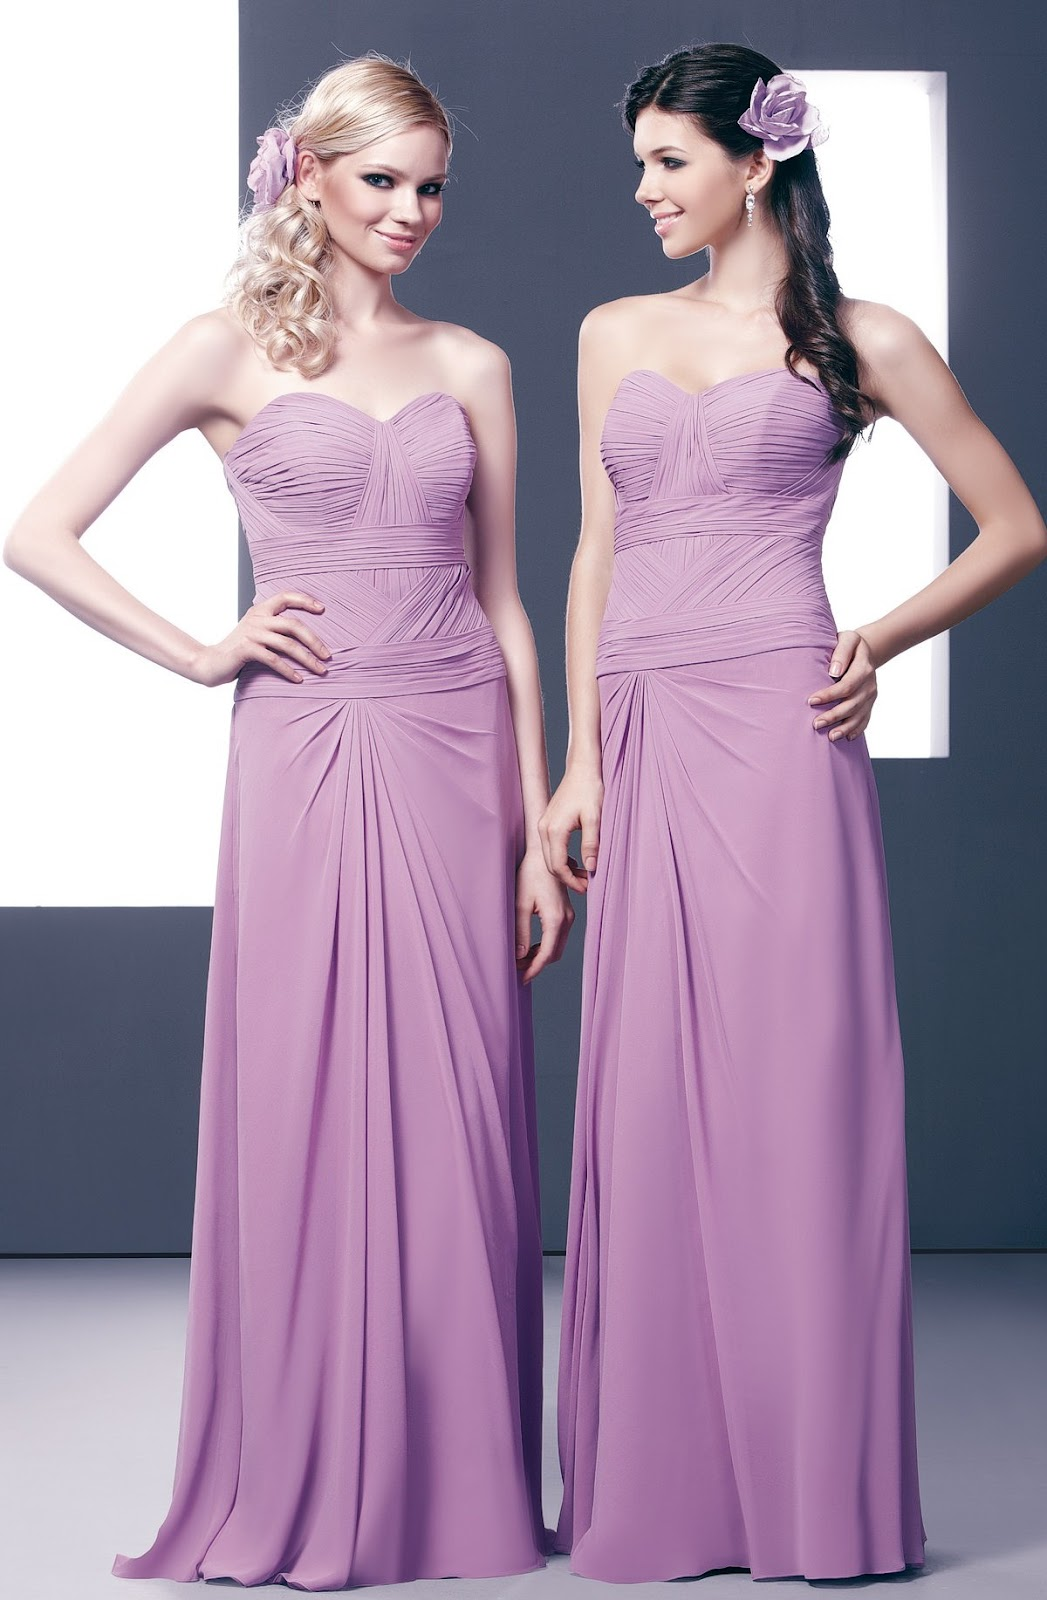 Zage Prom Dresses 20